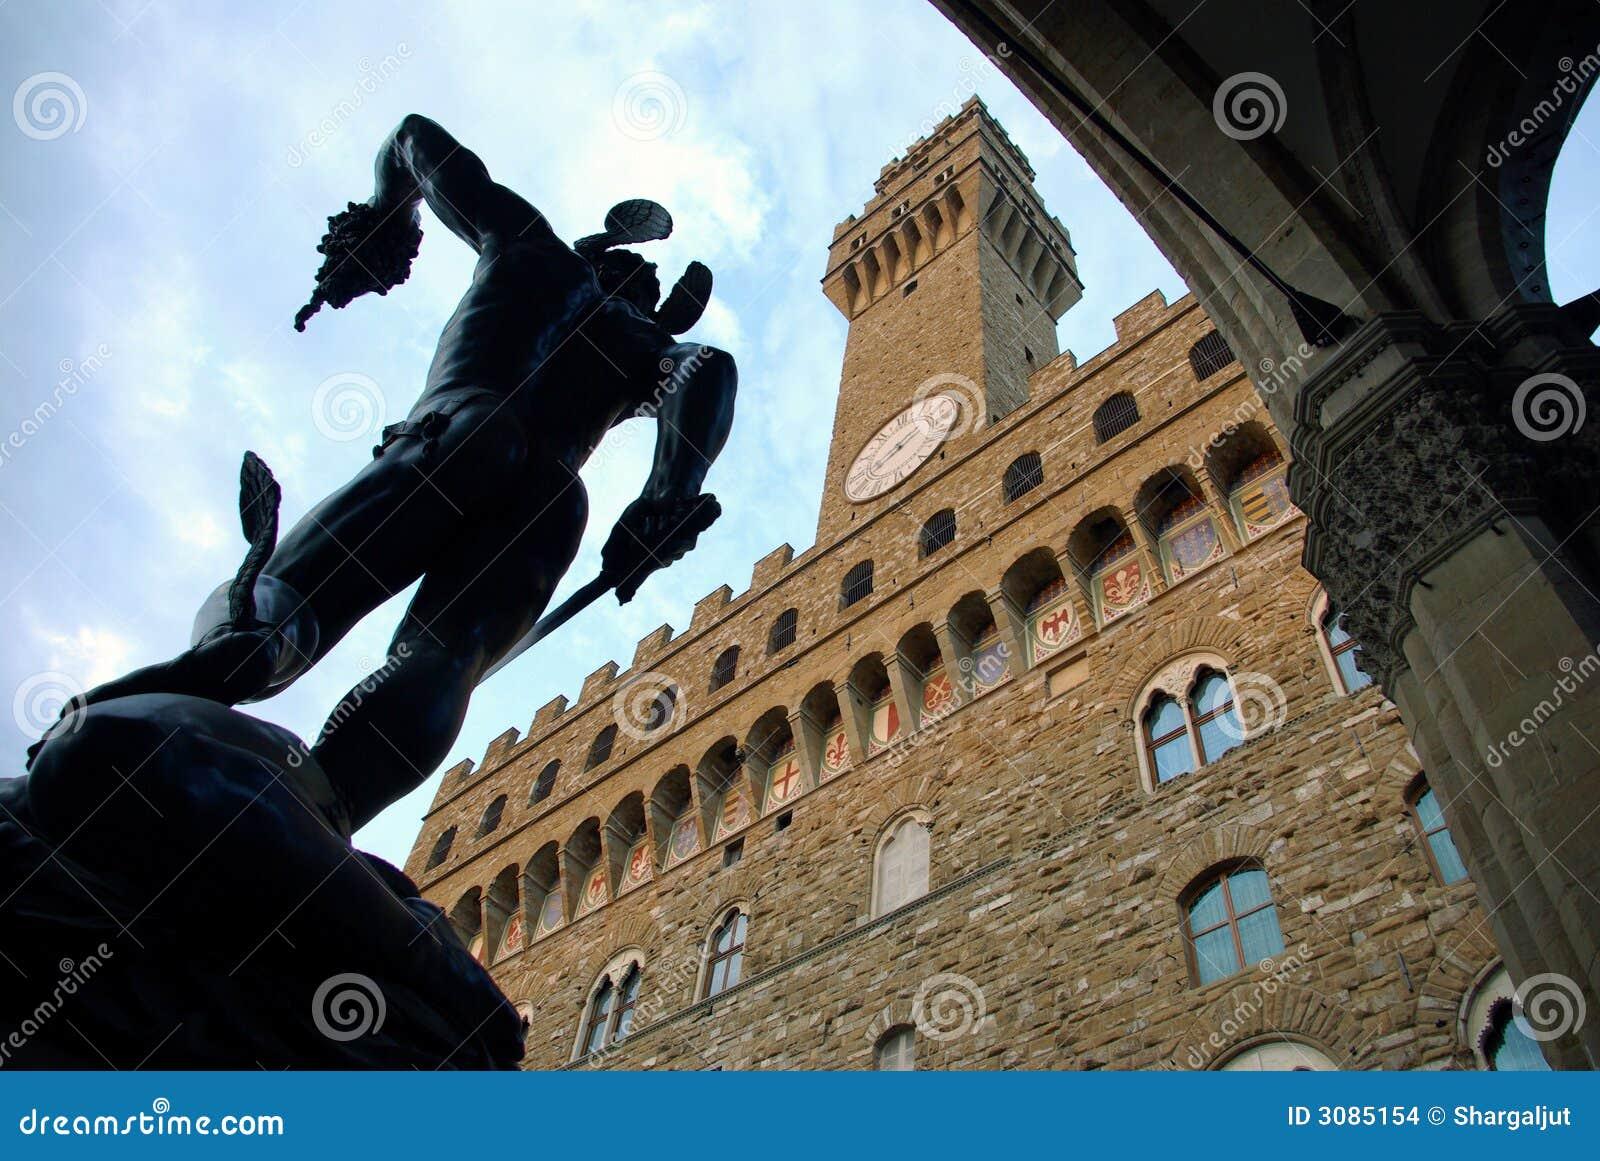 Florence italy palvecchio